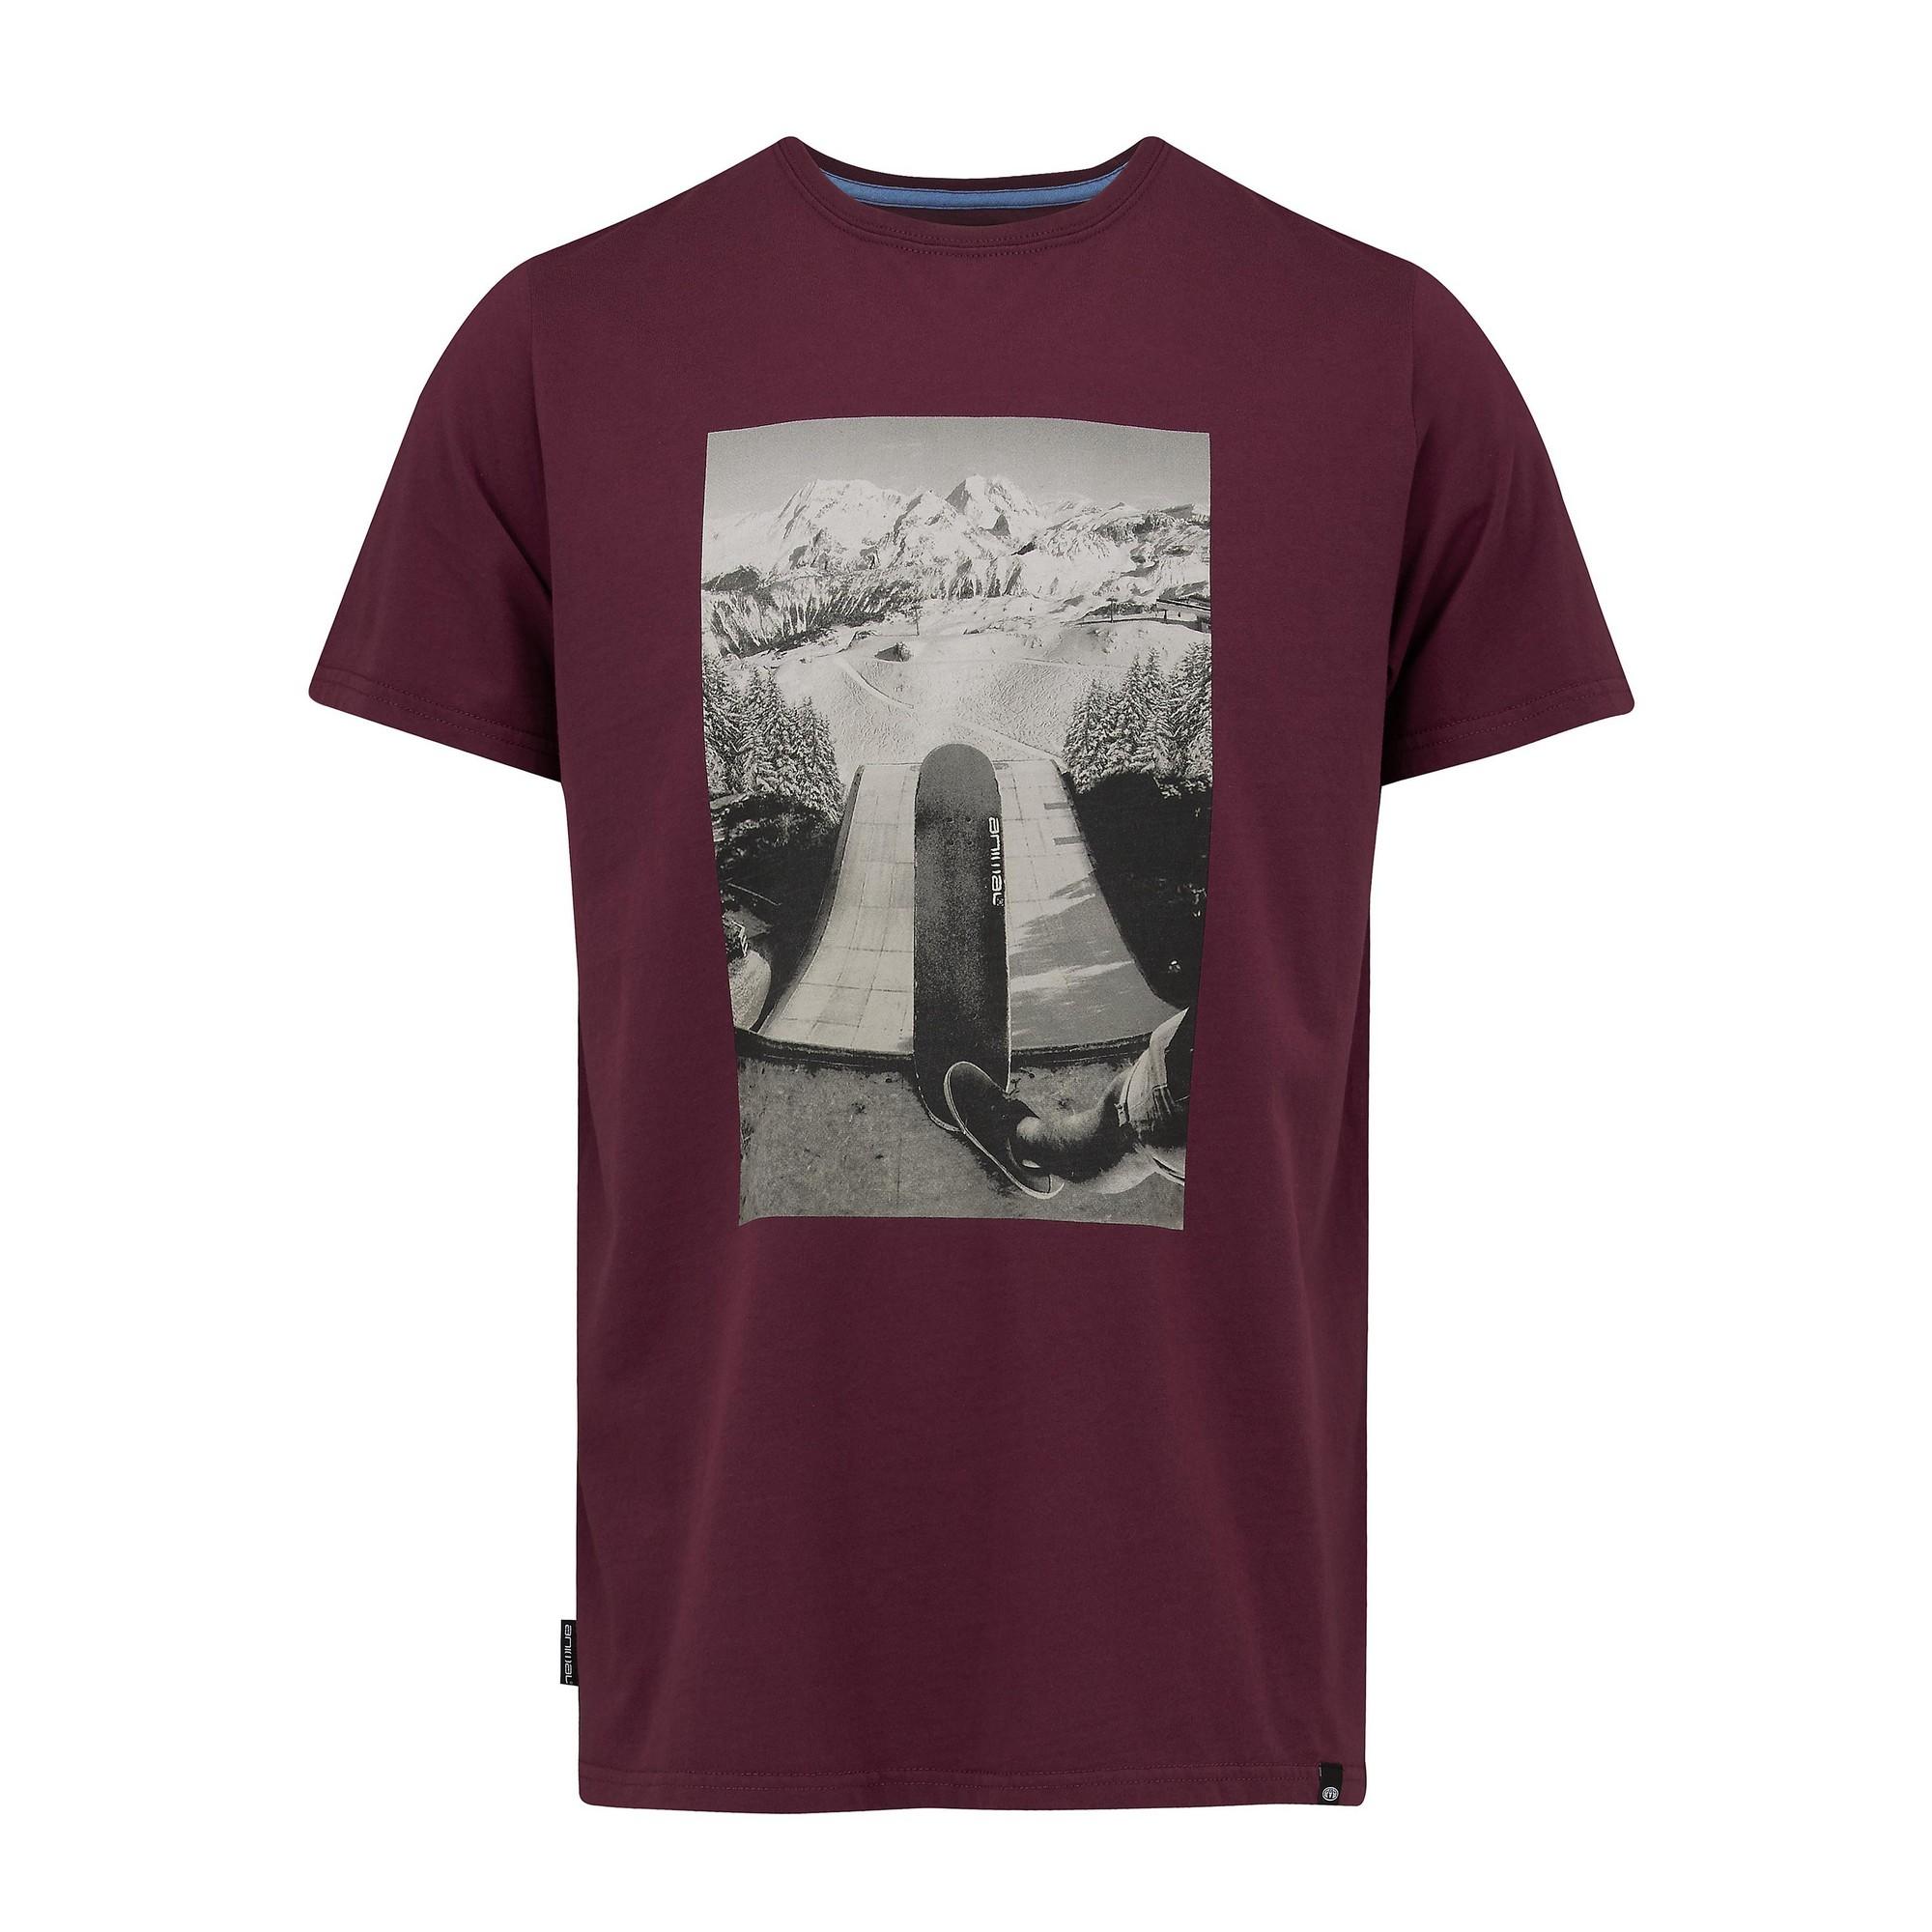 Animal-Camiseta-impresa-Escena-Skateboarding-hombre-caballero